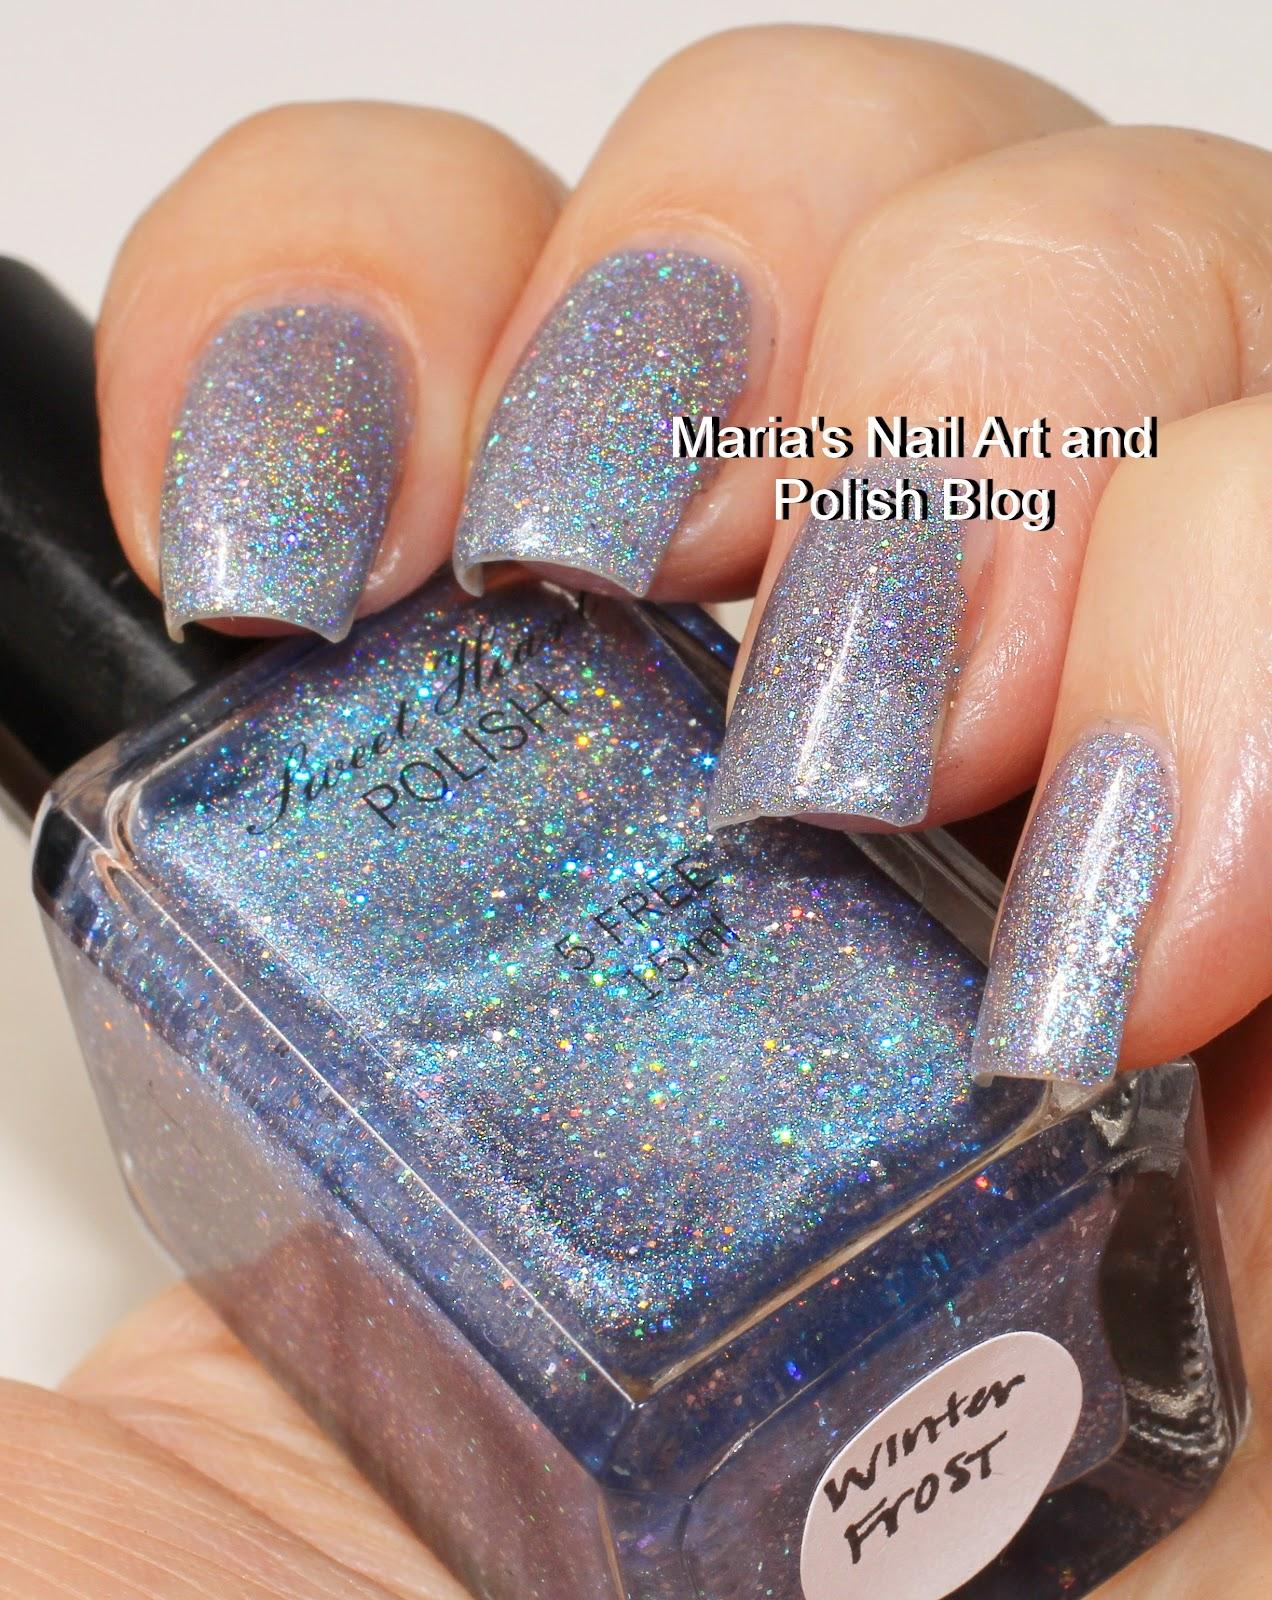 Marias Nail Art and Polish Blog: Sweet Heart Polish Winter Frost ...